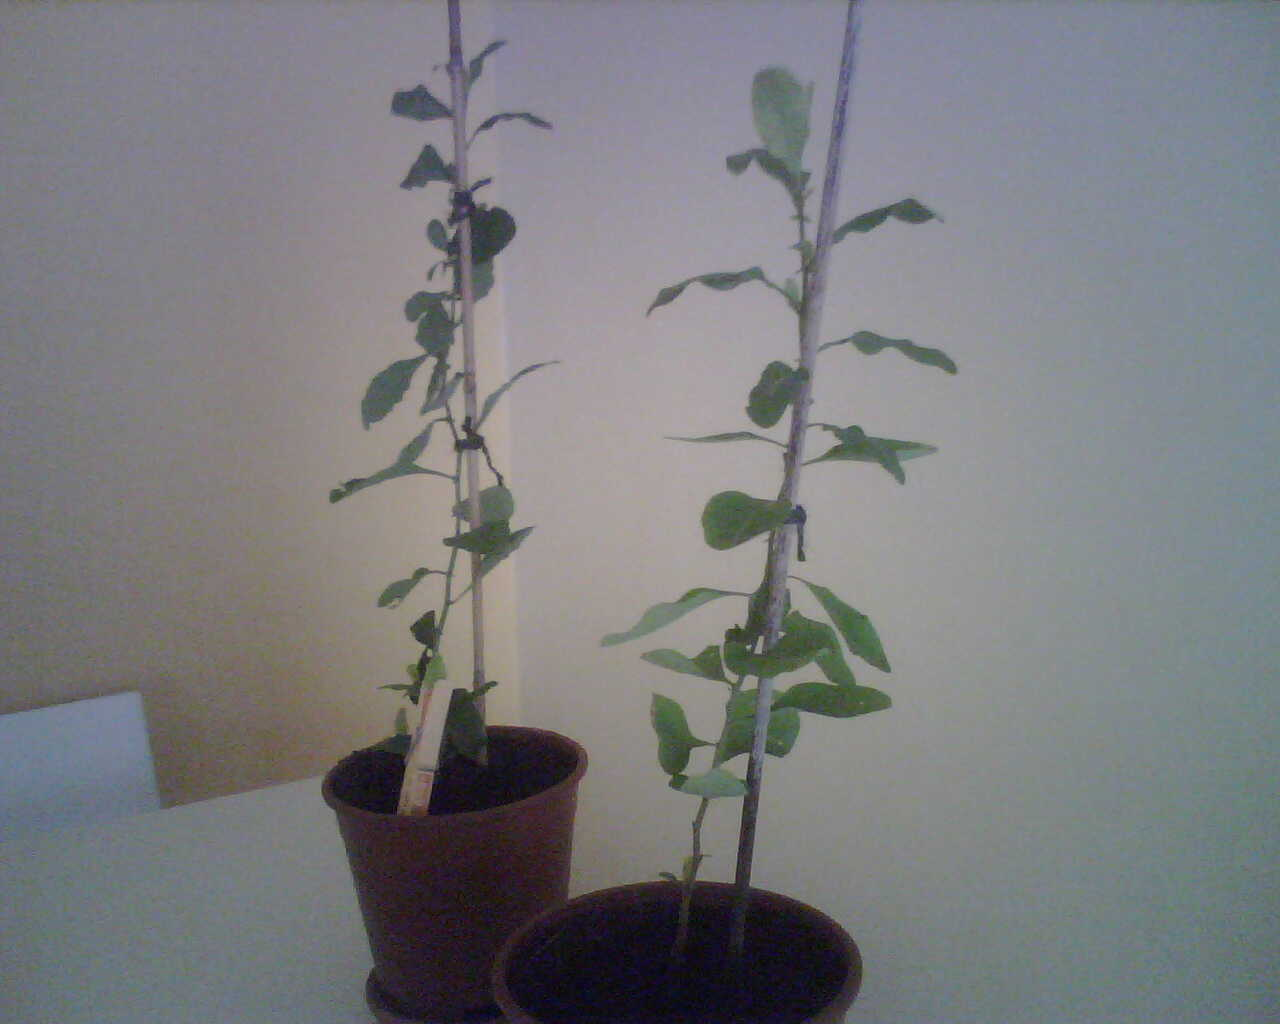 Venta de trepadoras o enredaderas for Jazmin planta precio